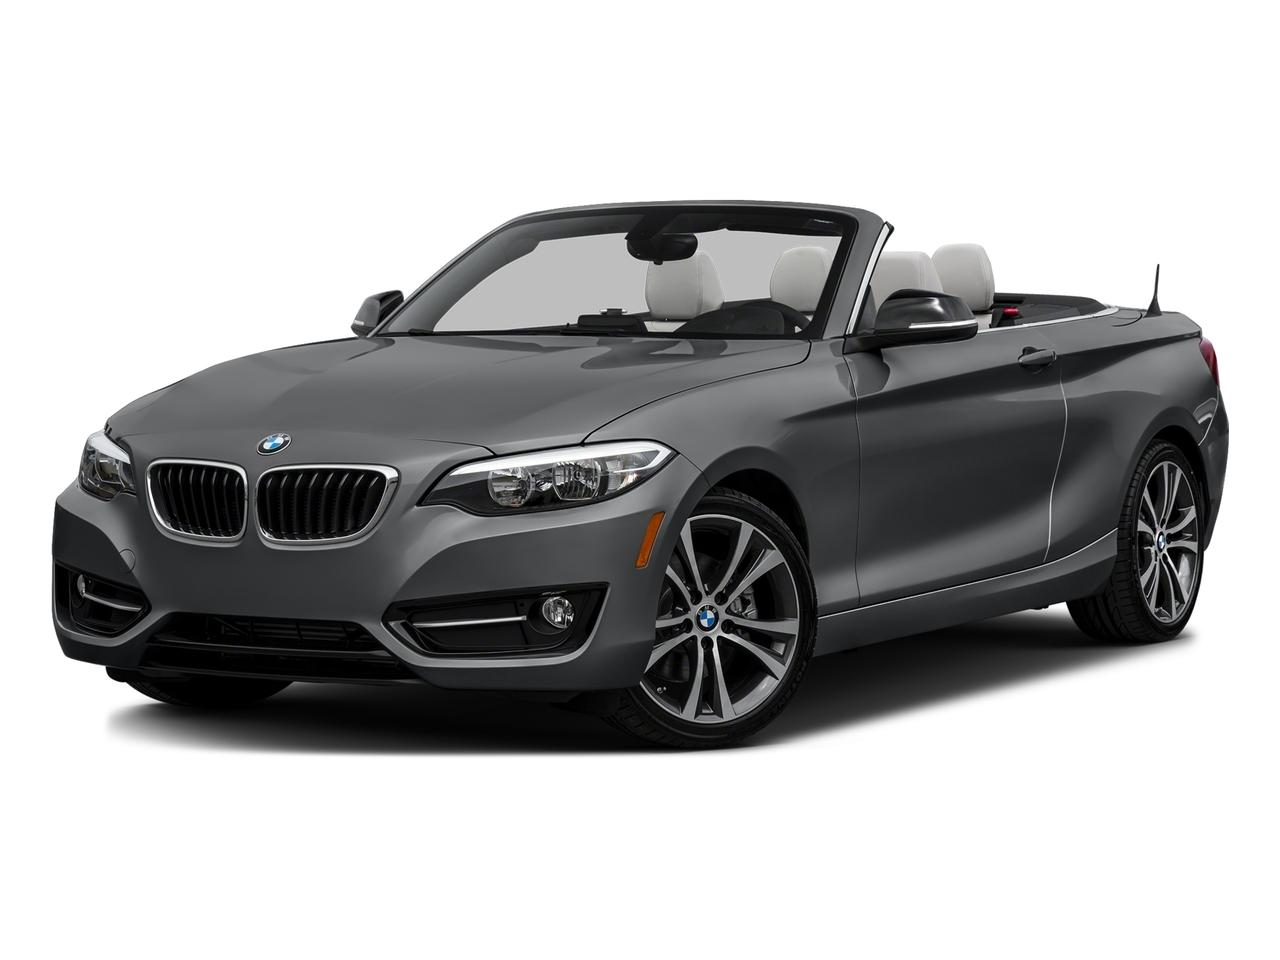 2017 BMW 230i Vehicle Photo in Pleasanton, CA 94588